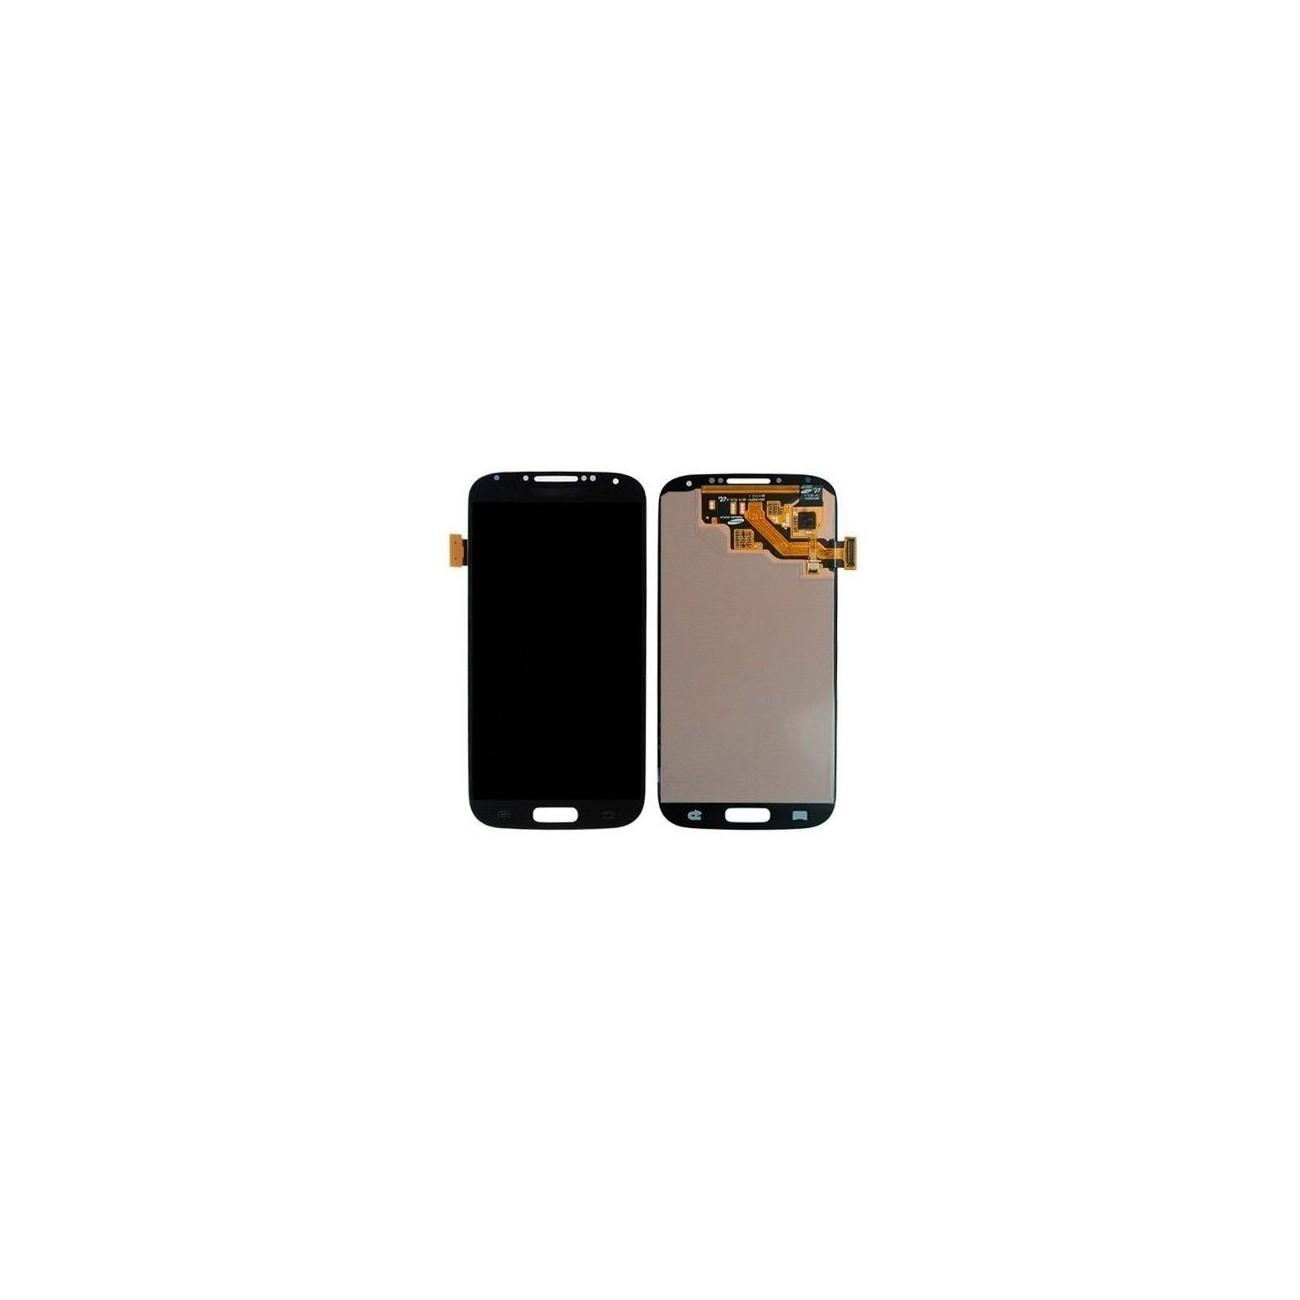 Tcset 599371031 - Pant. tactil + LCD Galaxy s4 i9505 Negro